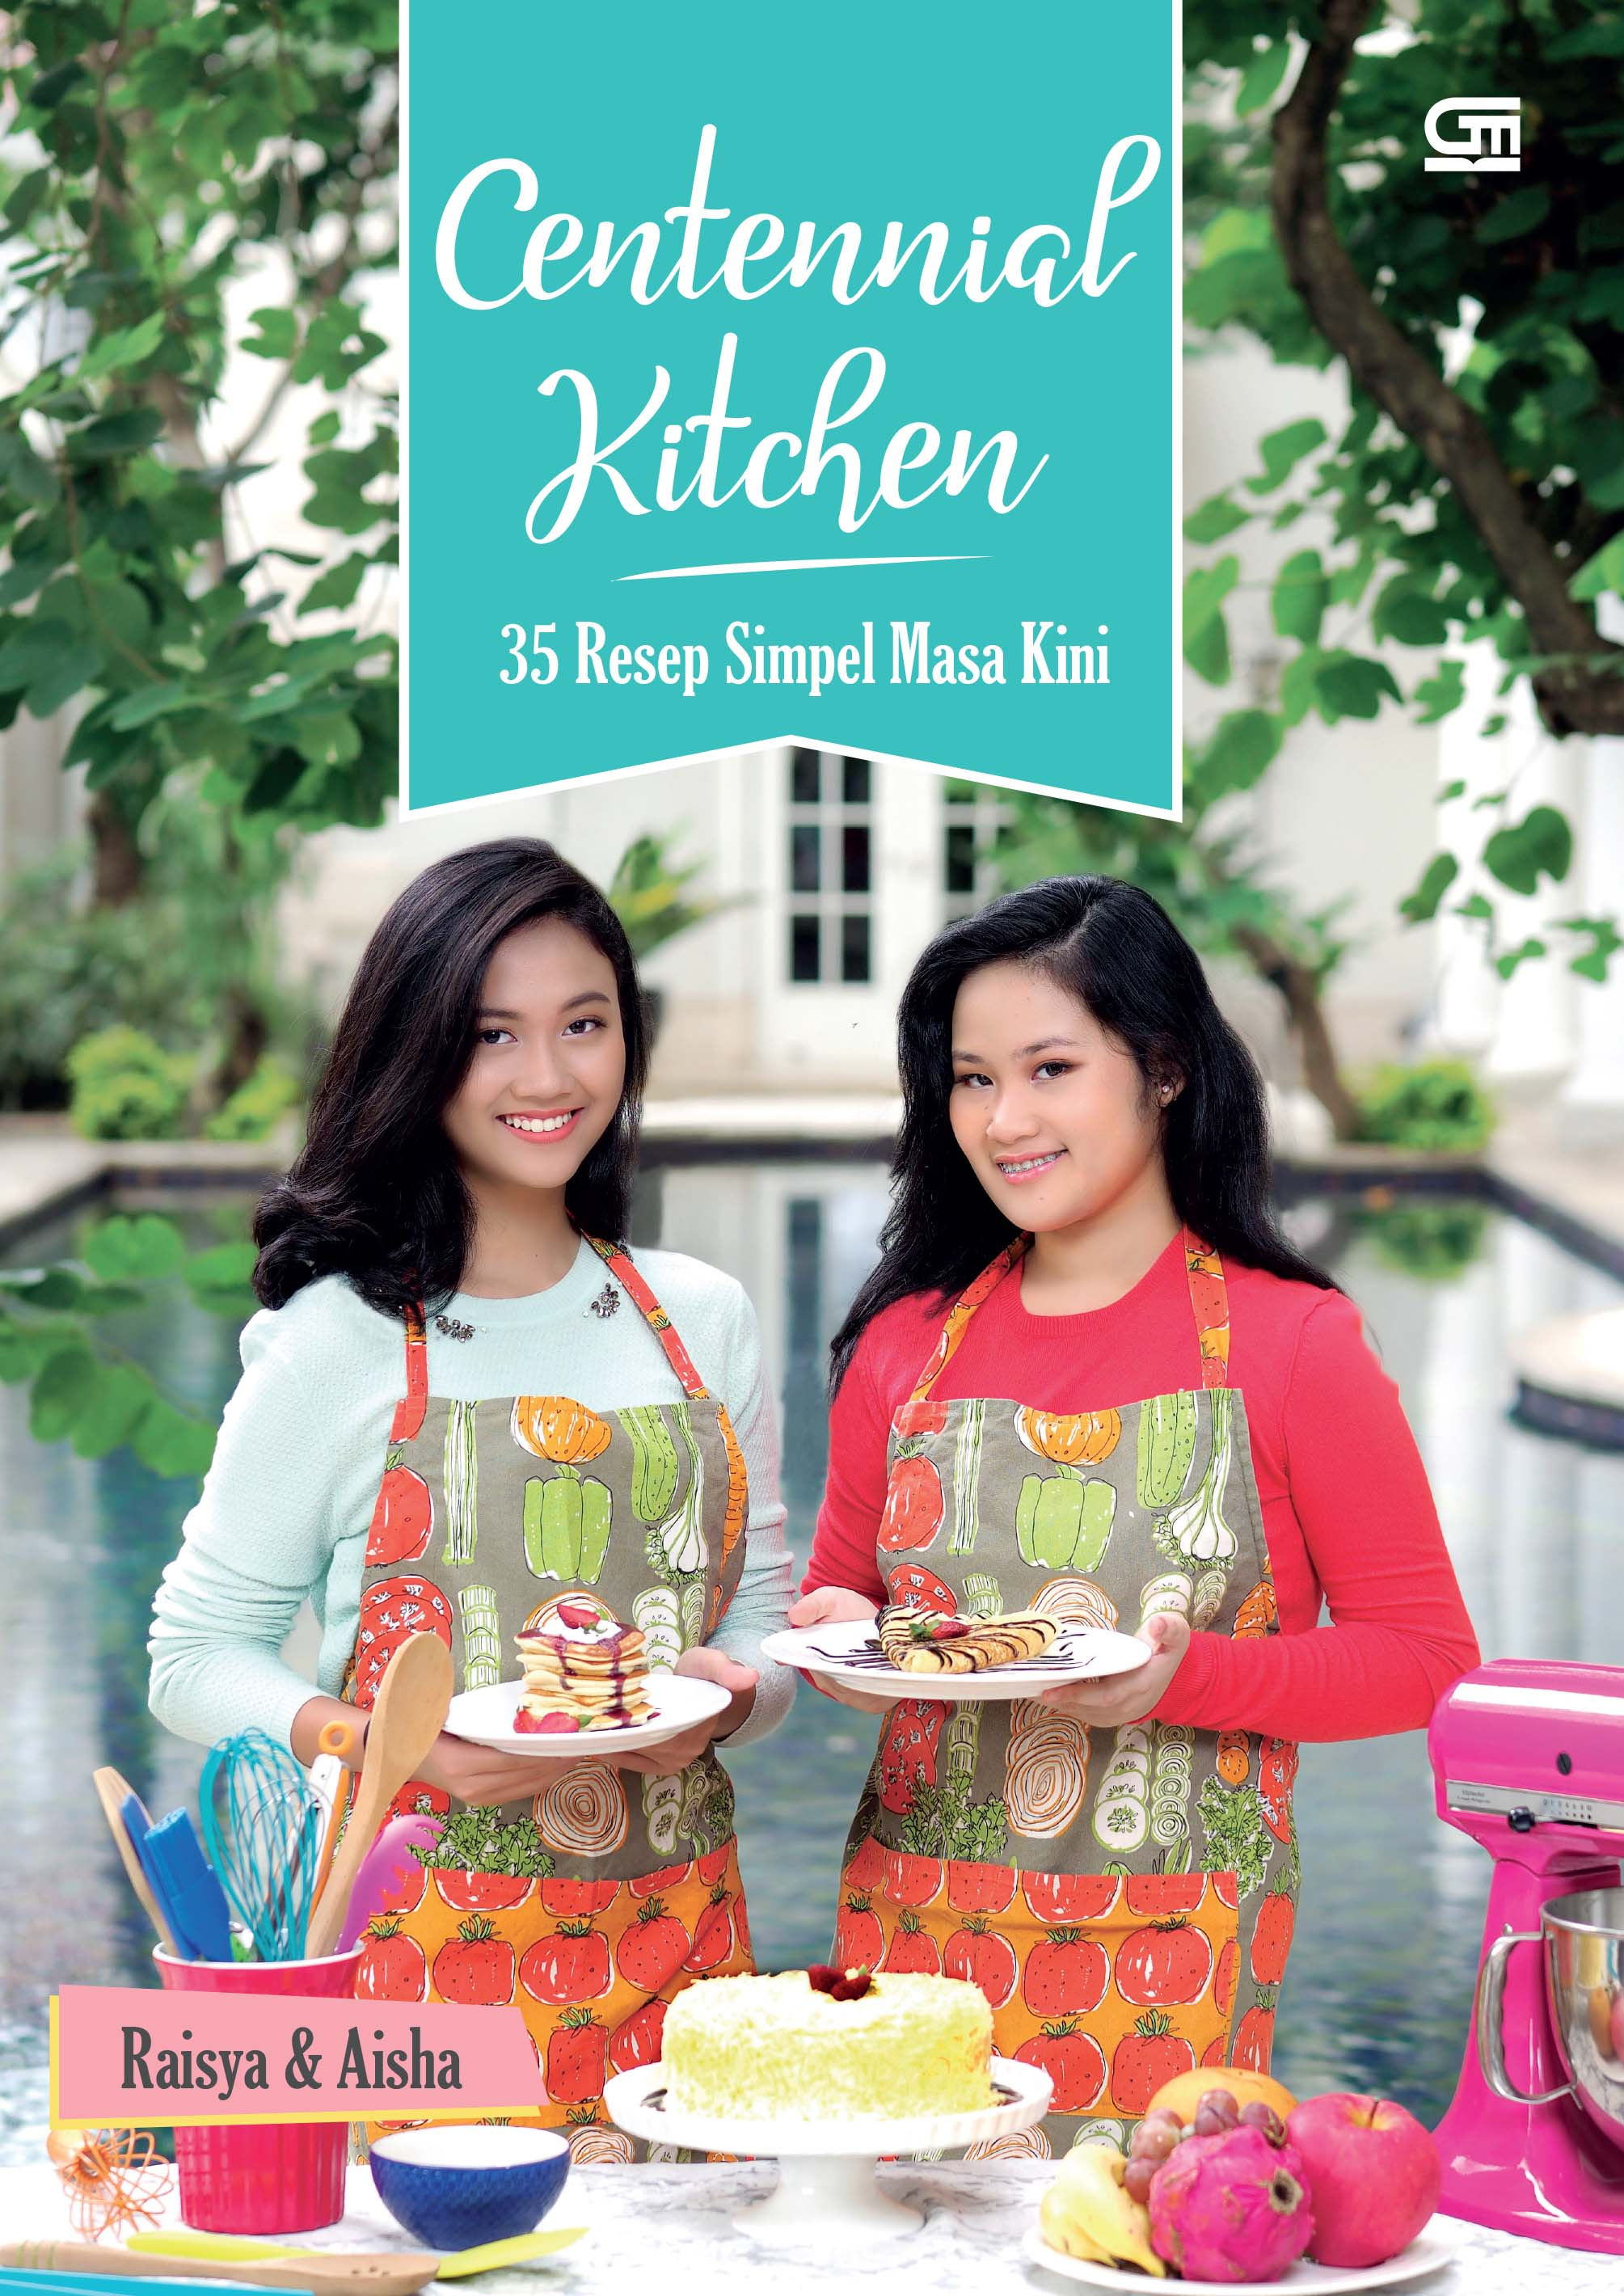 Centennial Kitchen: 35 Resep Simpel Masa Kini